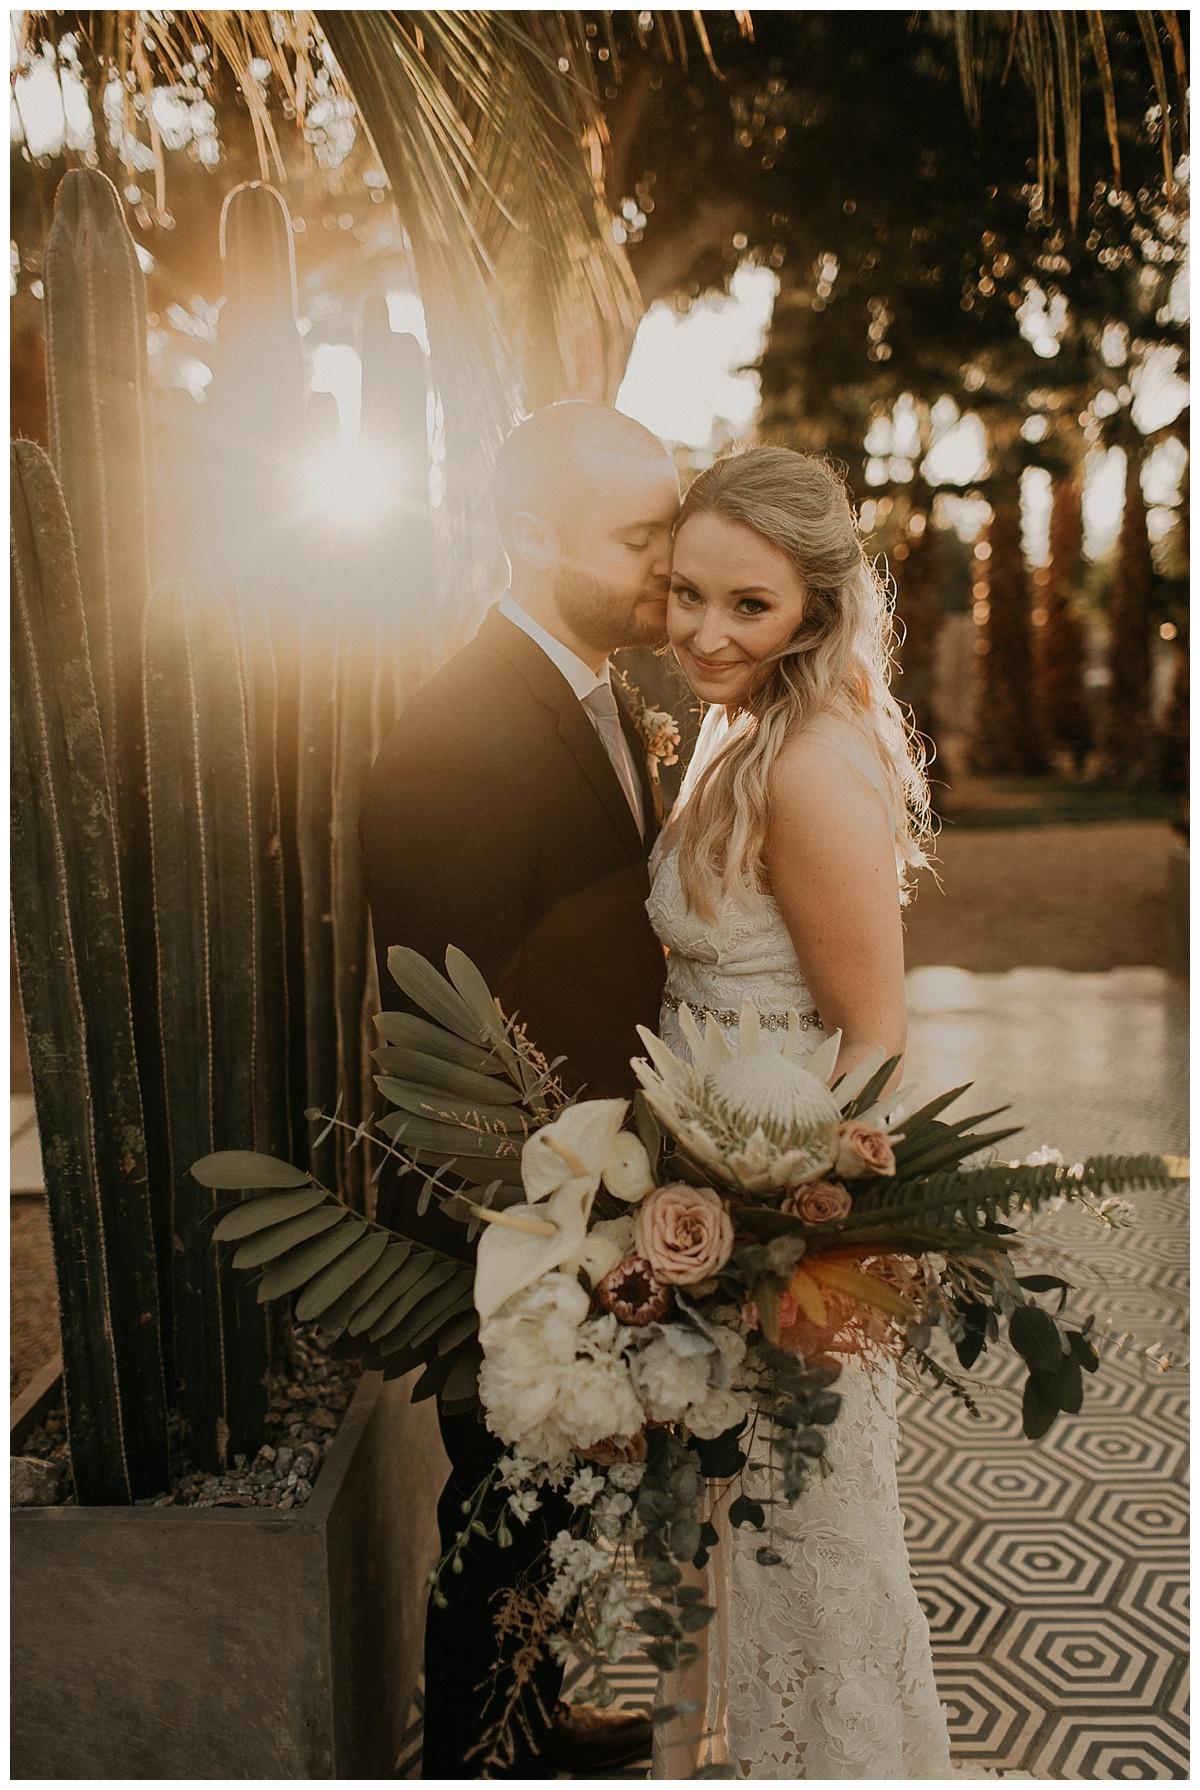 Bixby+Pine-PNW-Wedding-Planners-And-Designers_1787.jpg